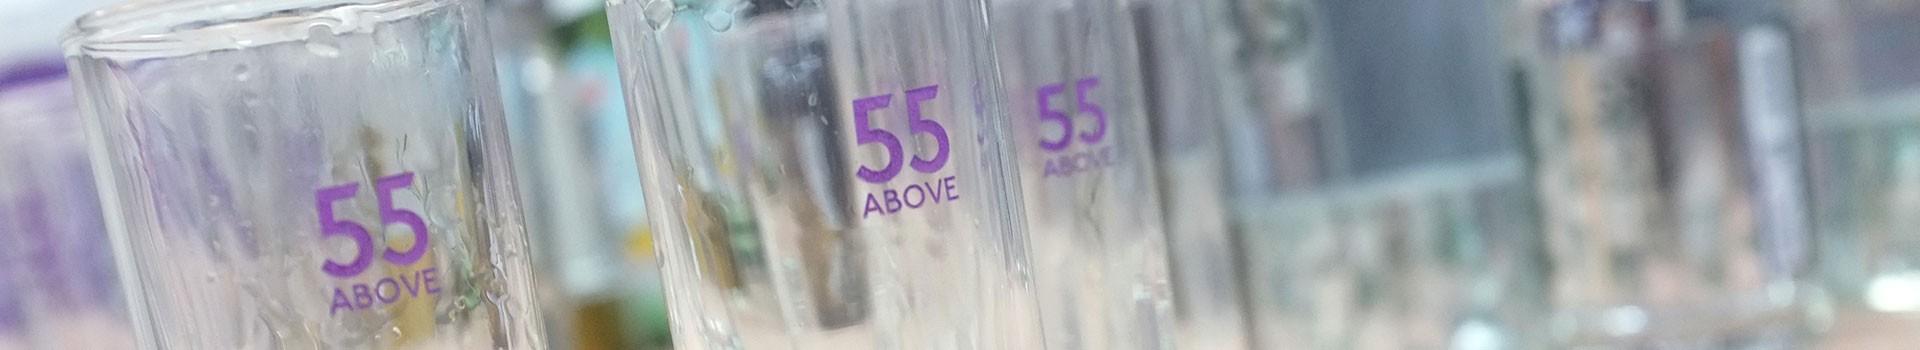 55 above vodka